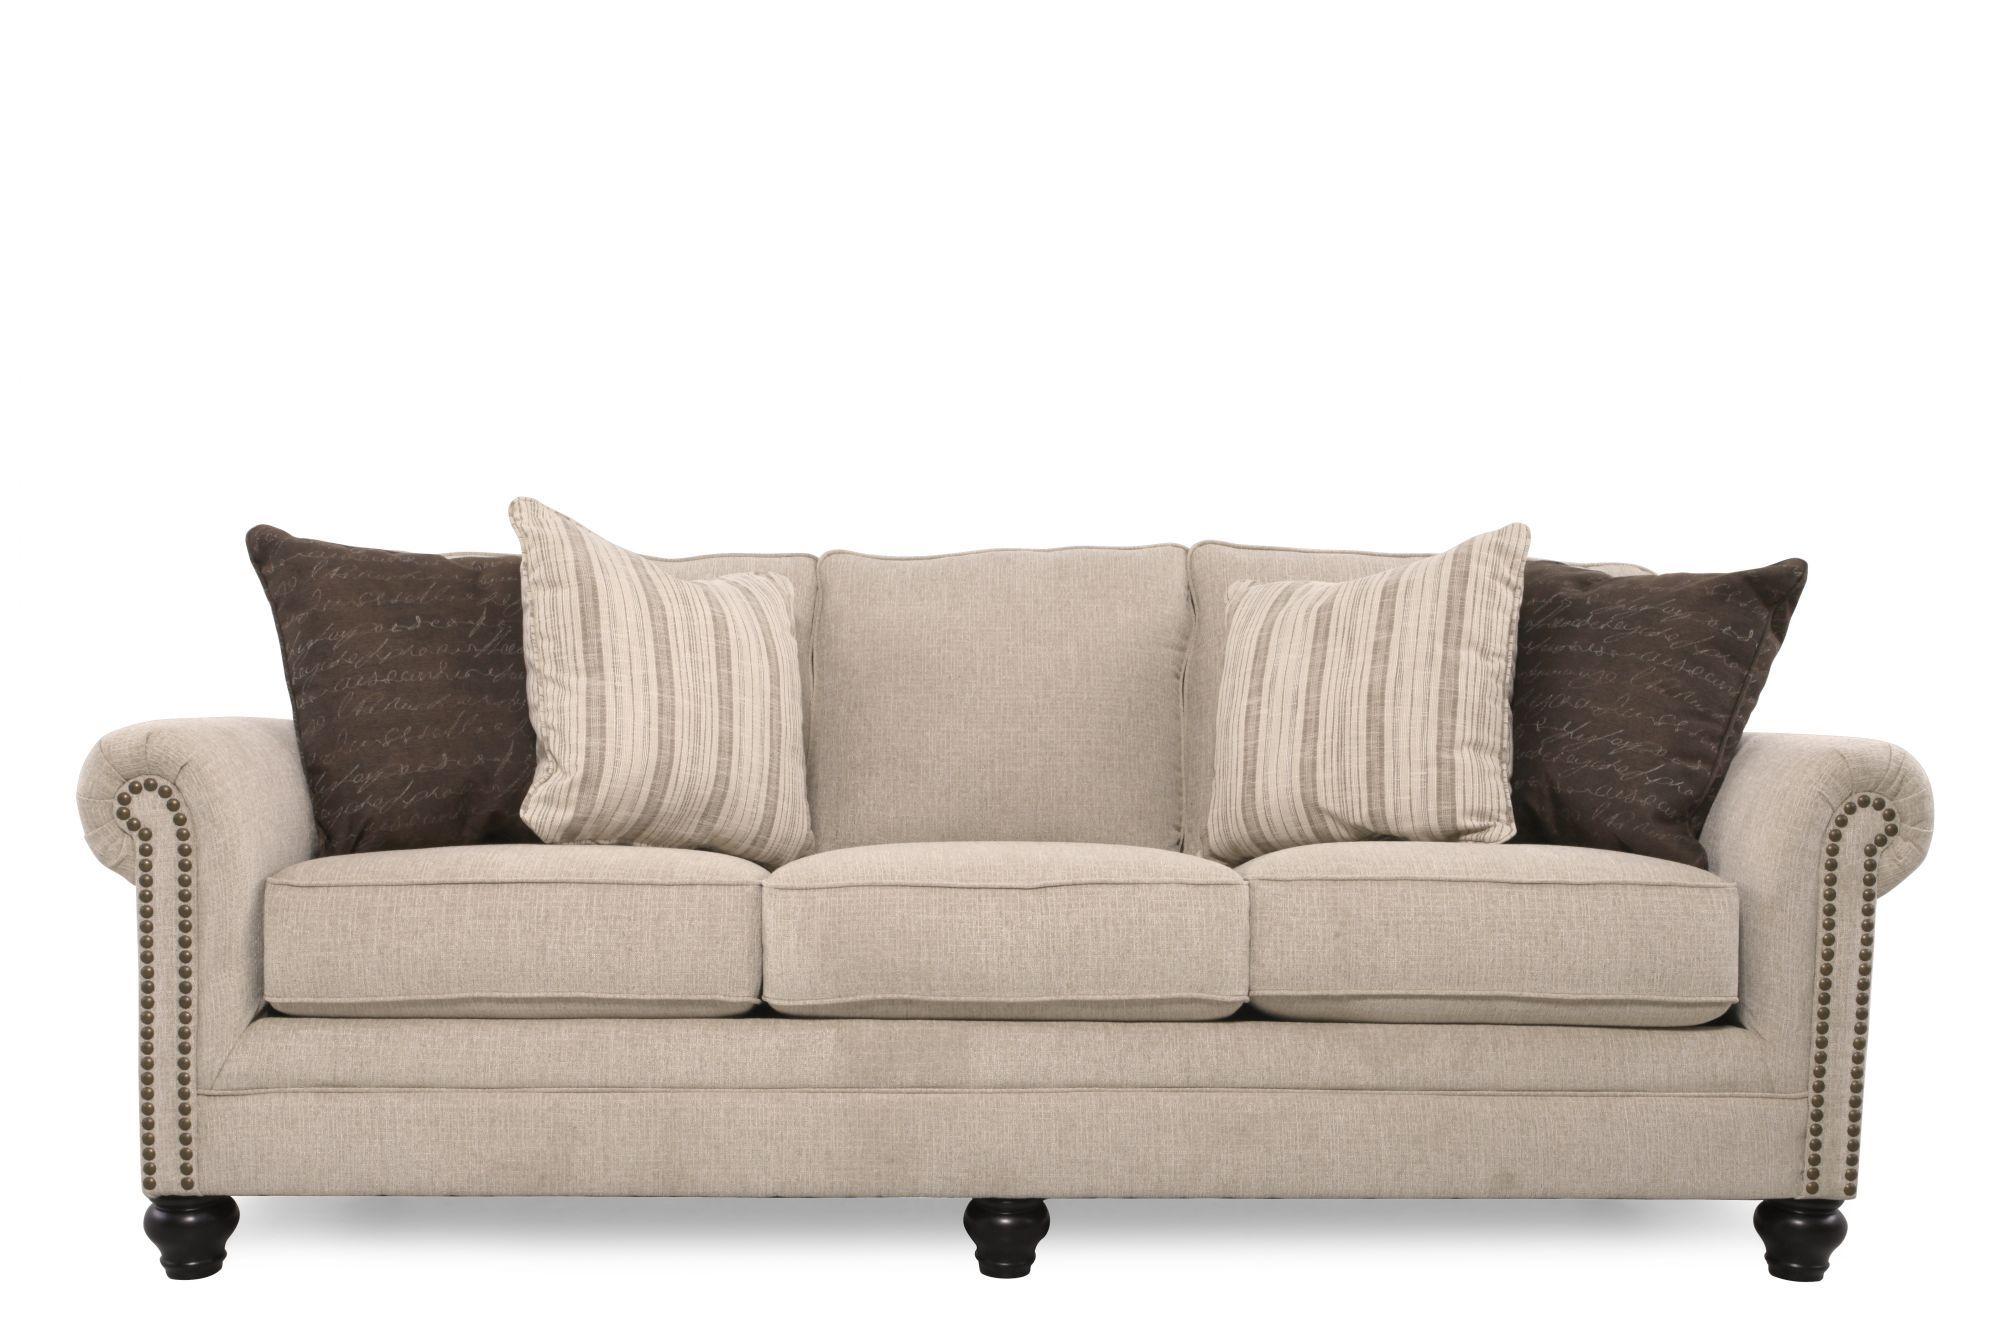 $498 454 for loveseat Ashley Milari Linen Sofa